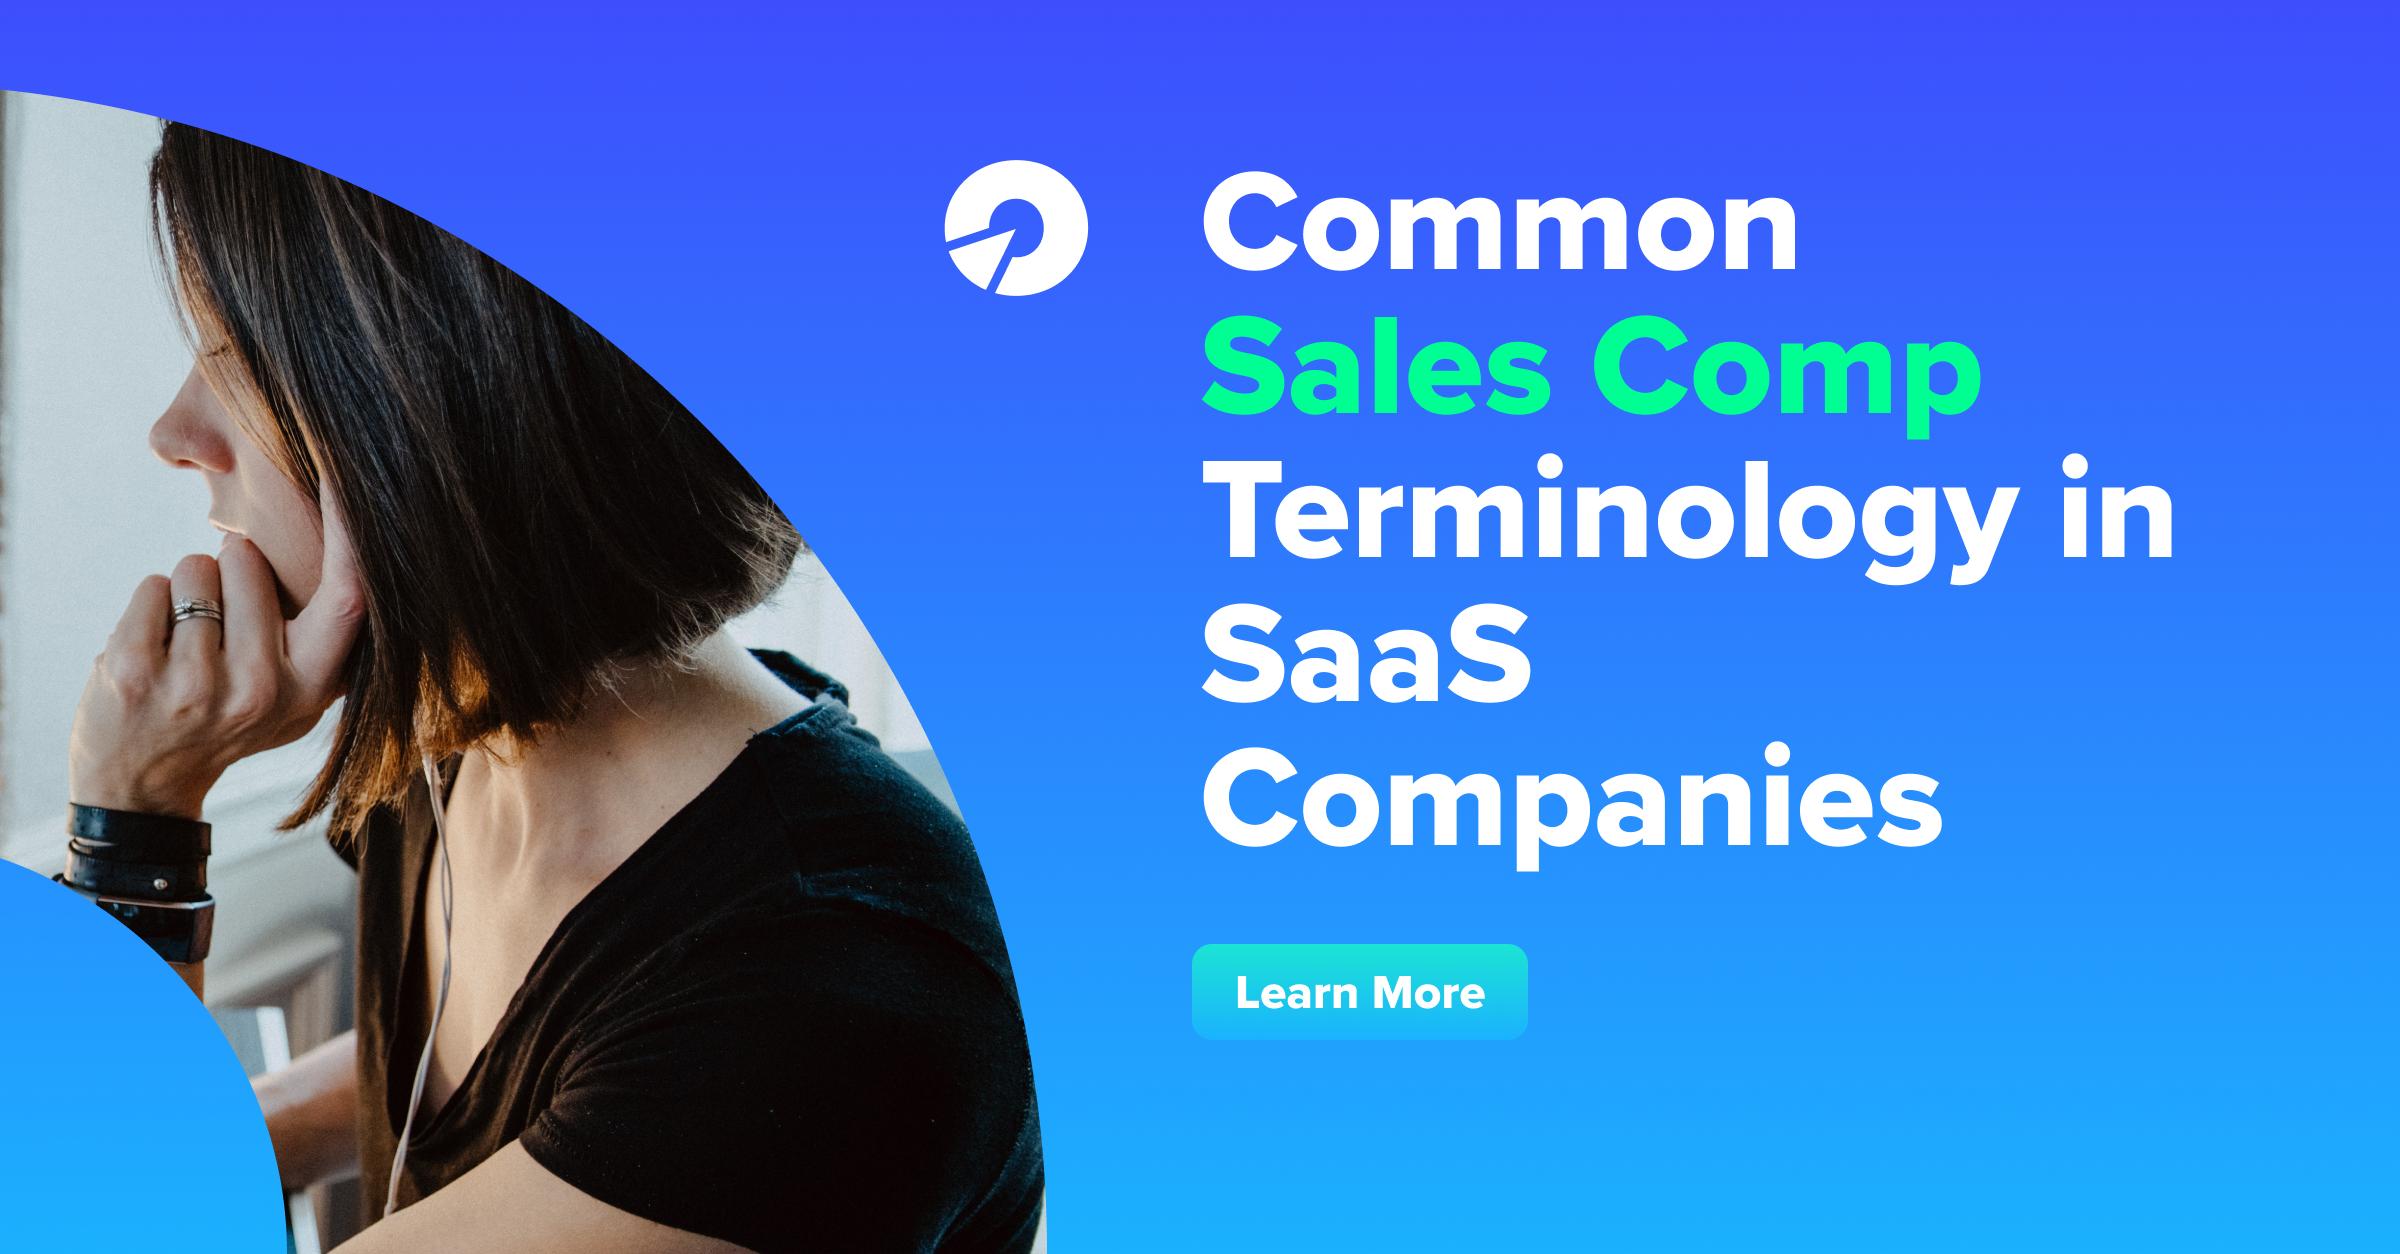 Common Sales Comp Terminology in SaaS